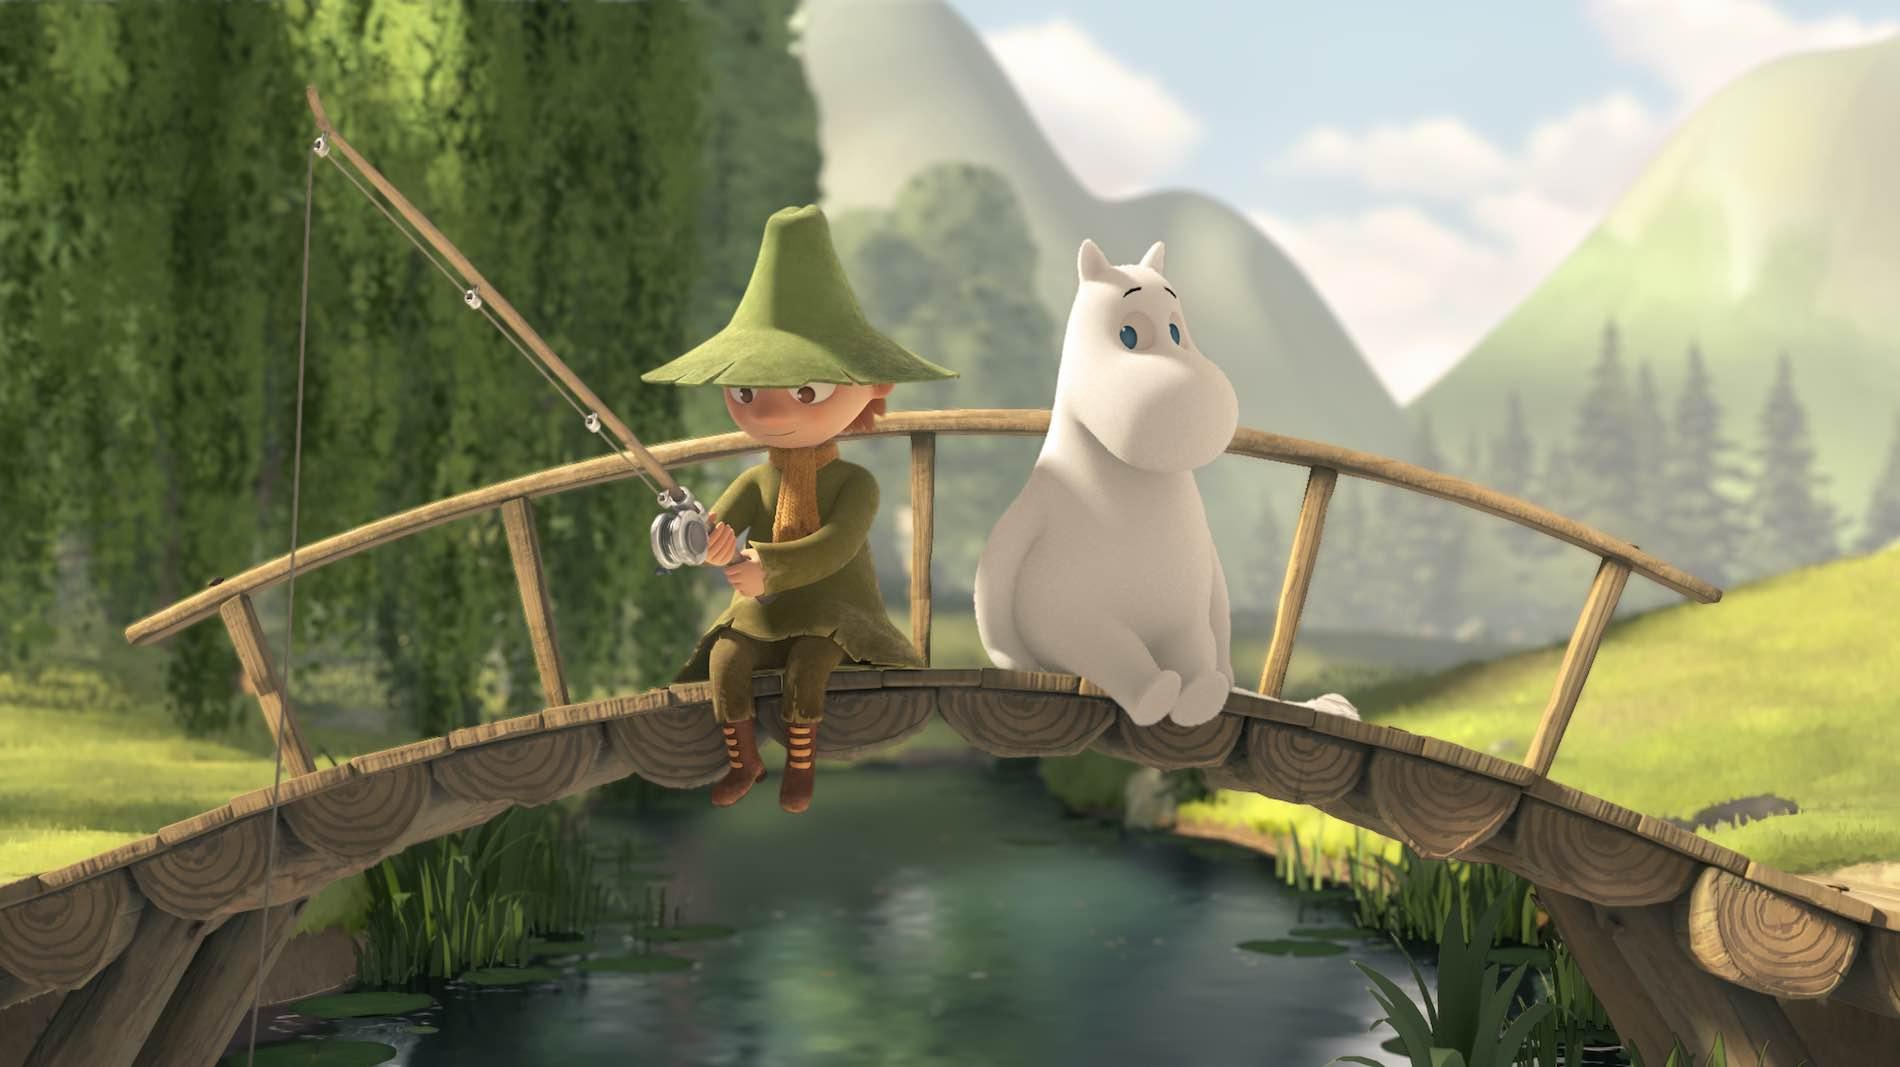 Mumins Serie, Moomin, ZDF, Kika, TV, Moominvalley, Zeichentrickserie, Animiert